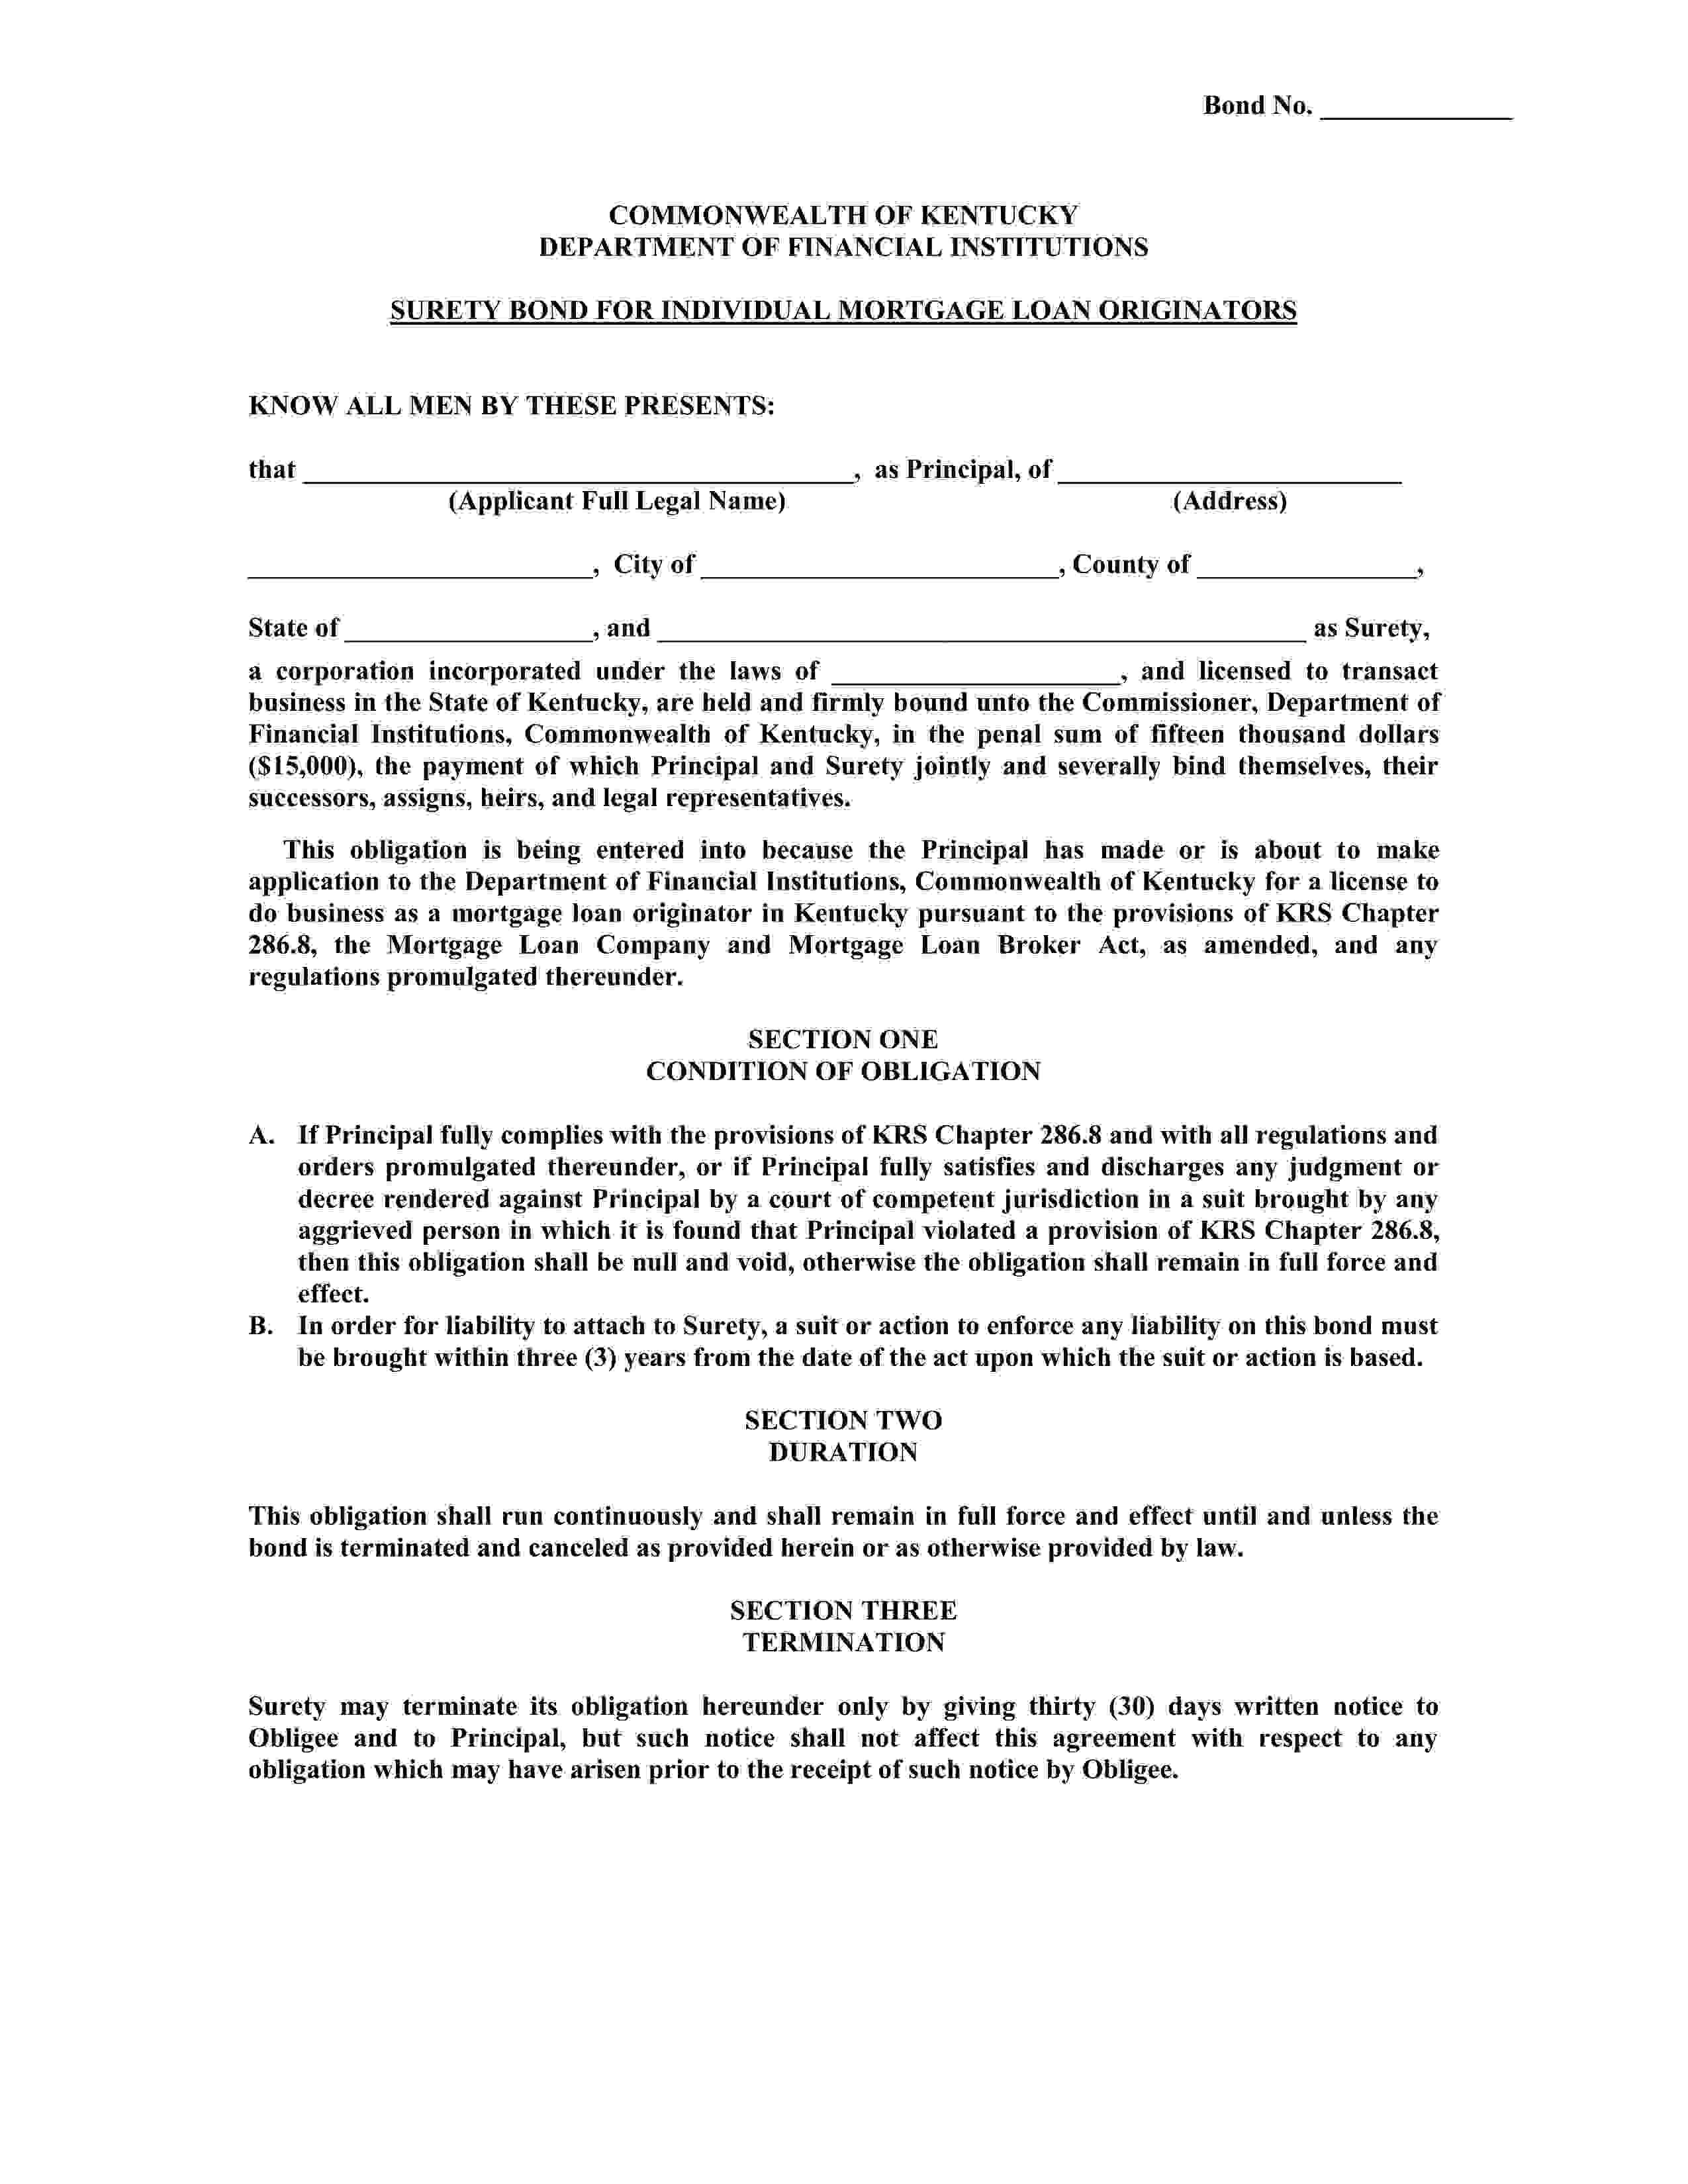 Commonwealth of Kentucky Mortgage Loan Originator sample image